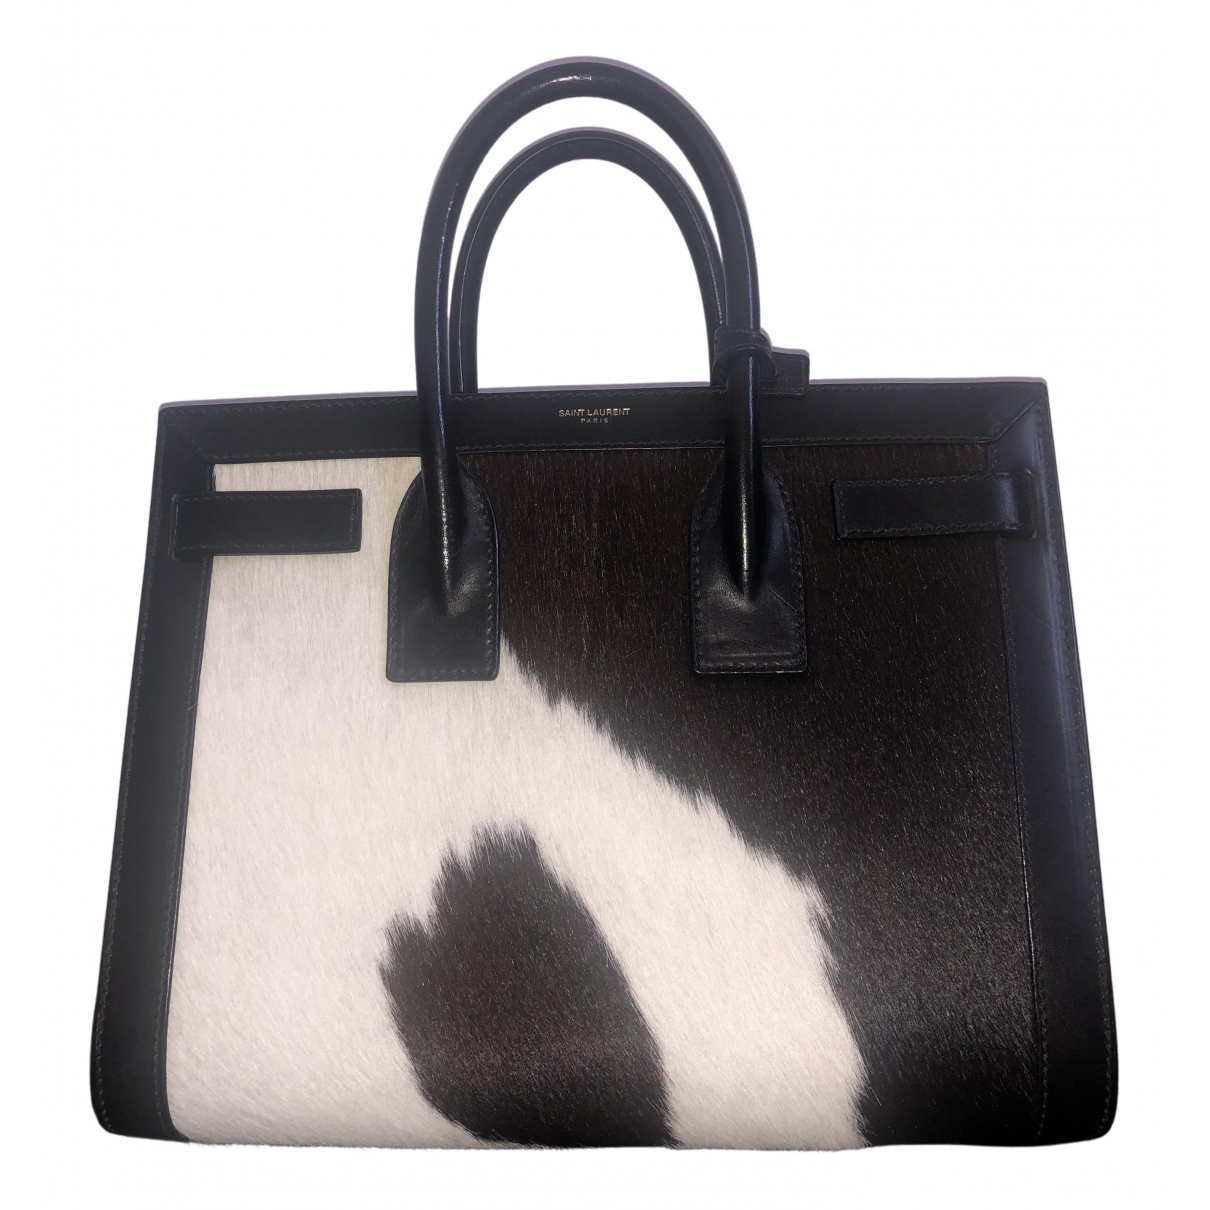 Saint Laurent Sac de Jour Multicolour Pony-style calfskin handbag for Women \N